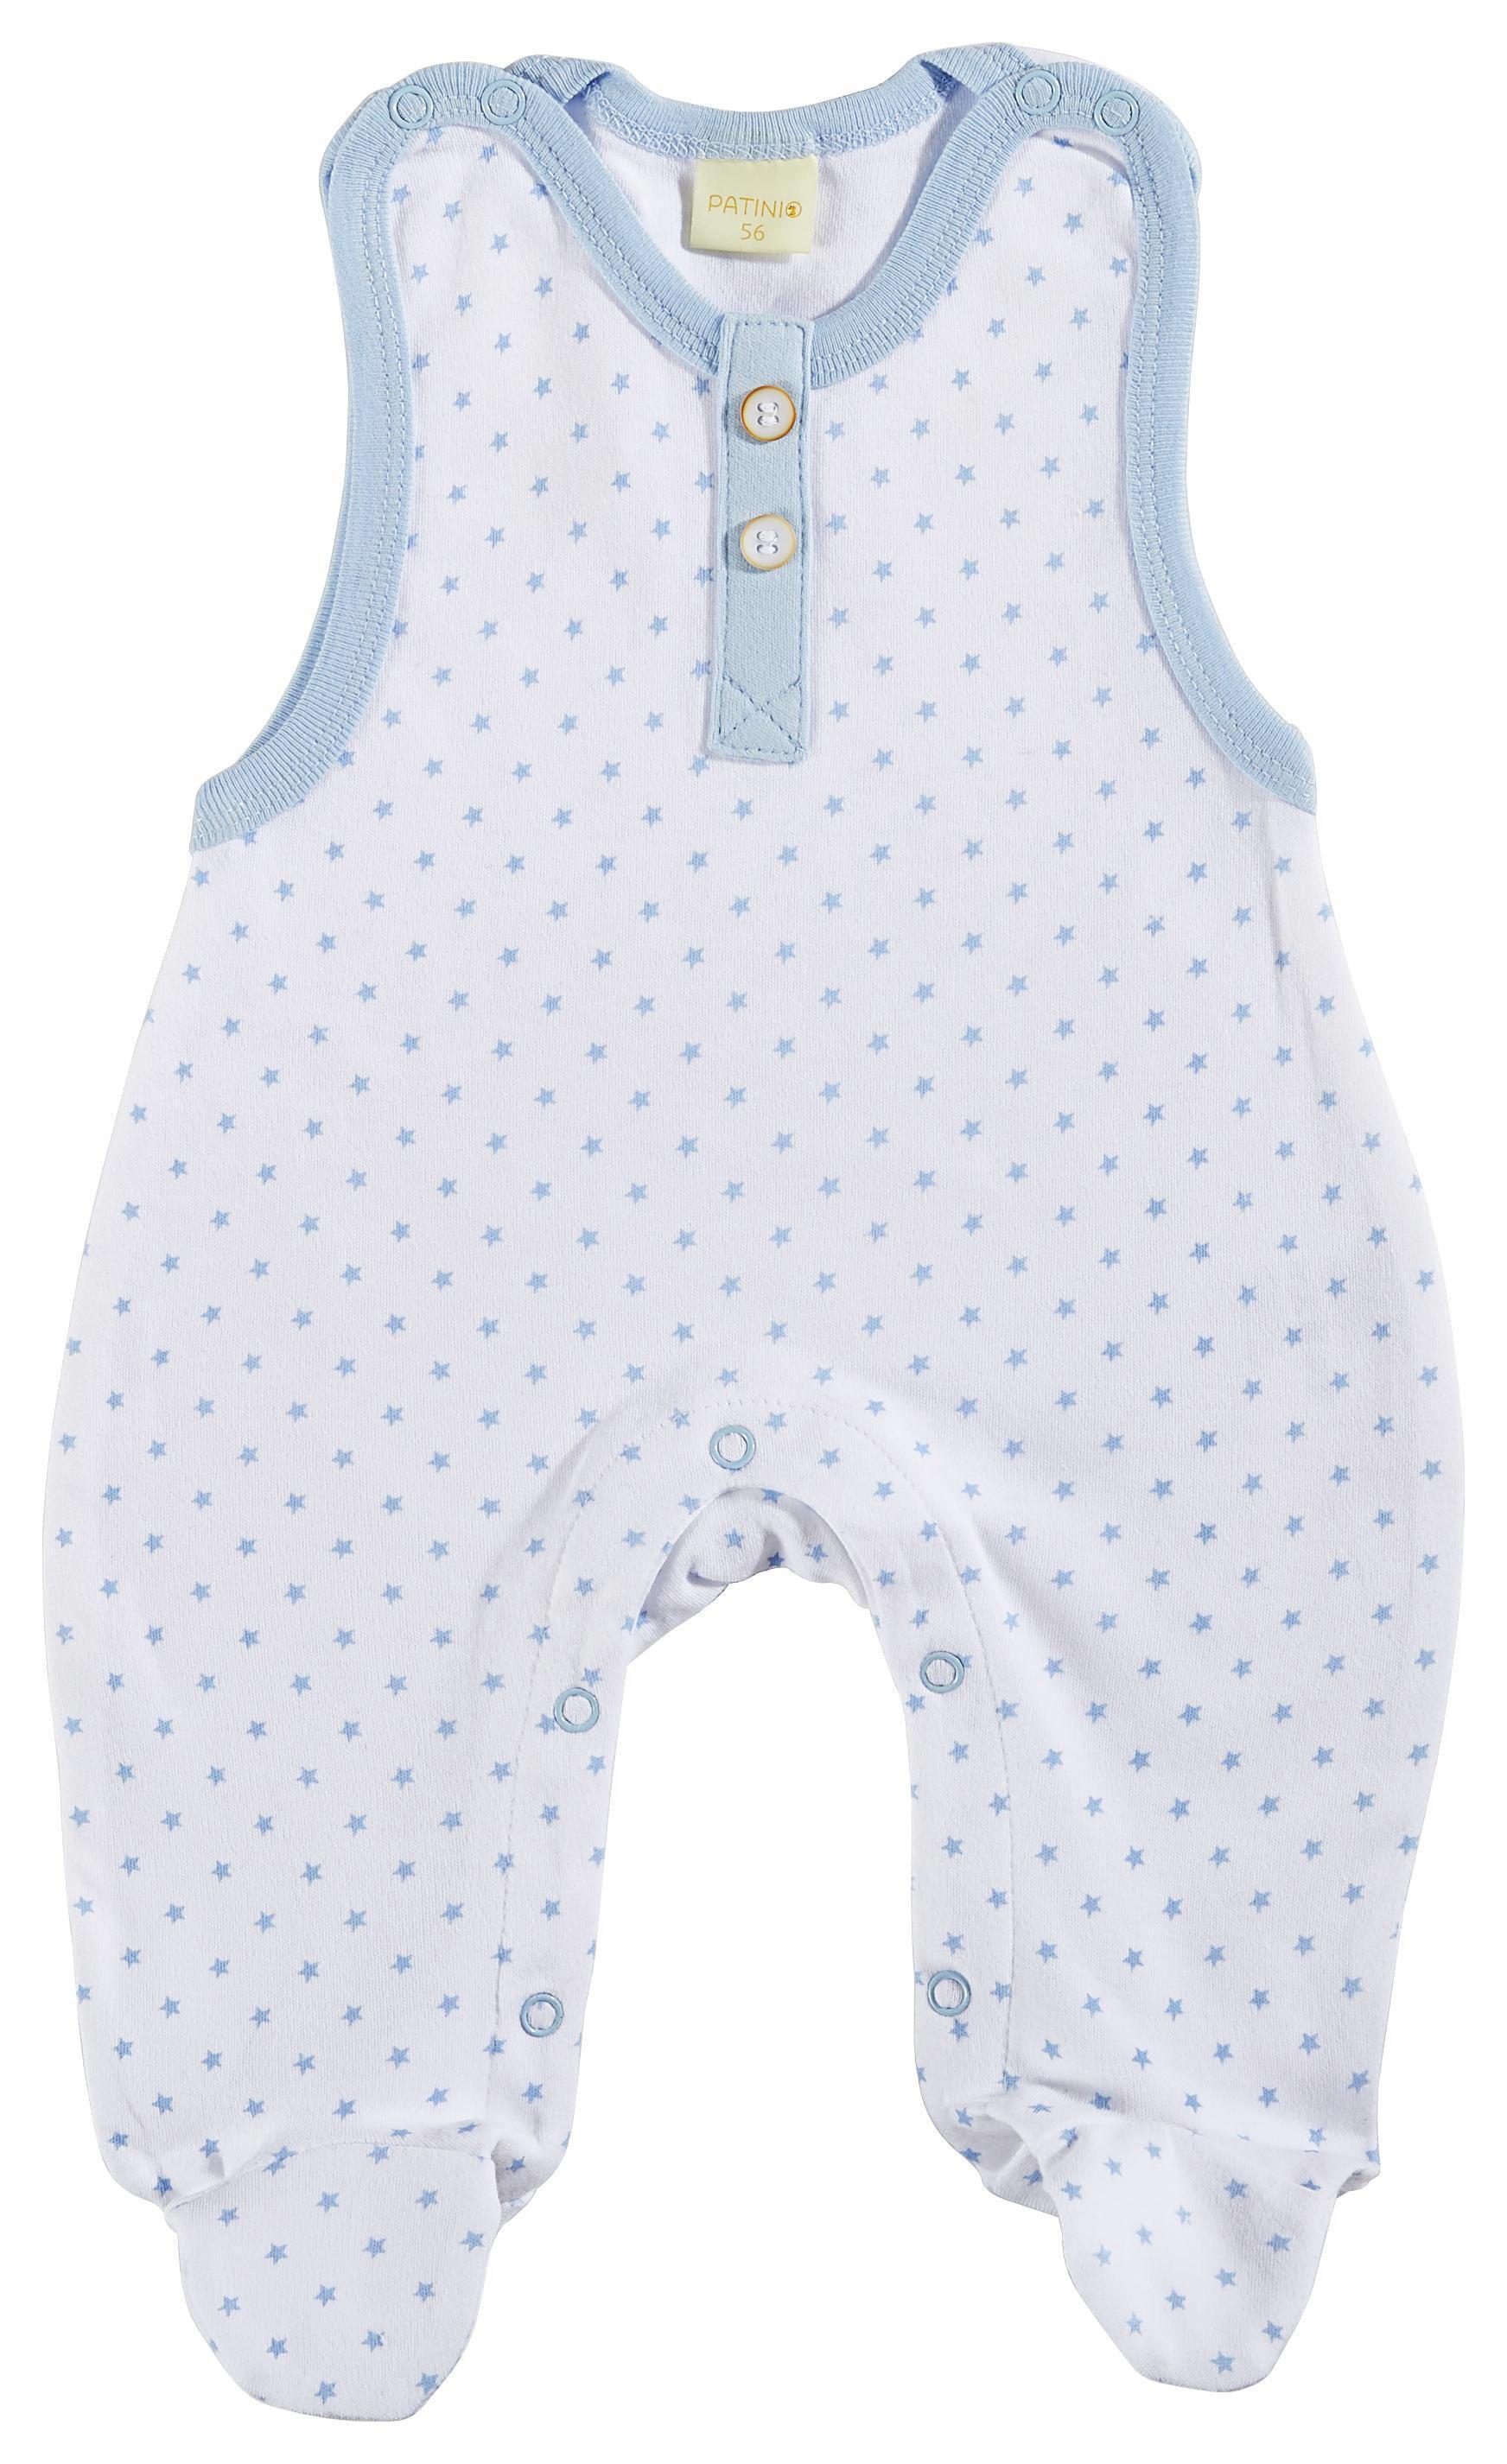 STRAMPLER - Weiß/Hellblau, Basics, Textil (56) - PATINIO